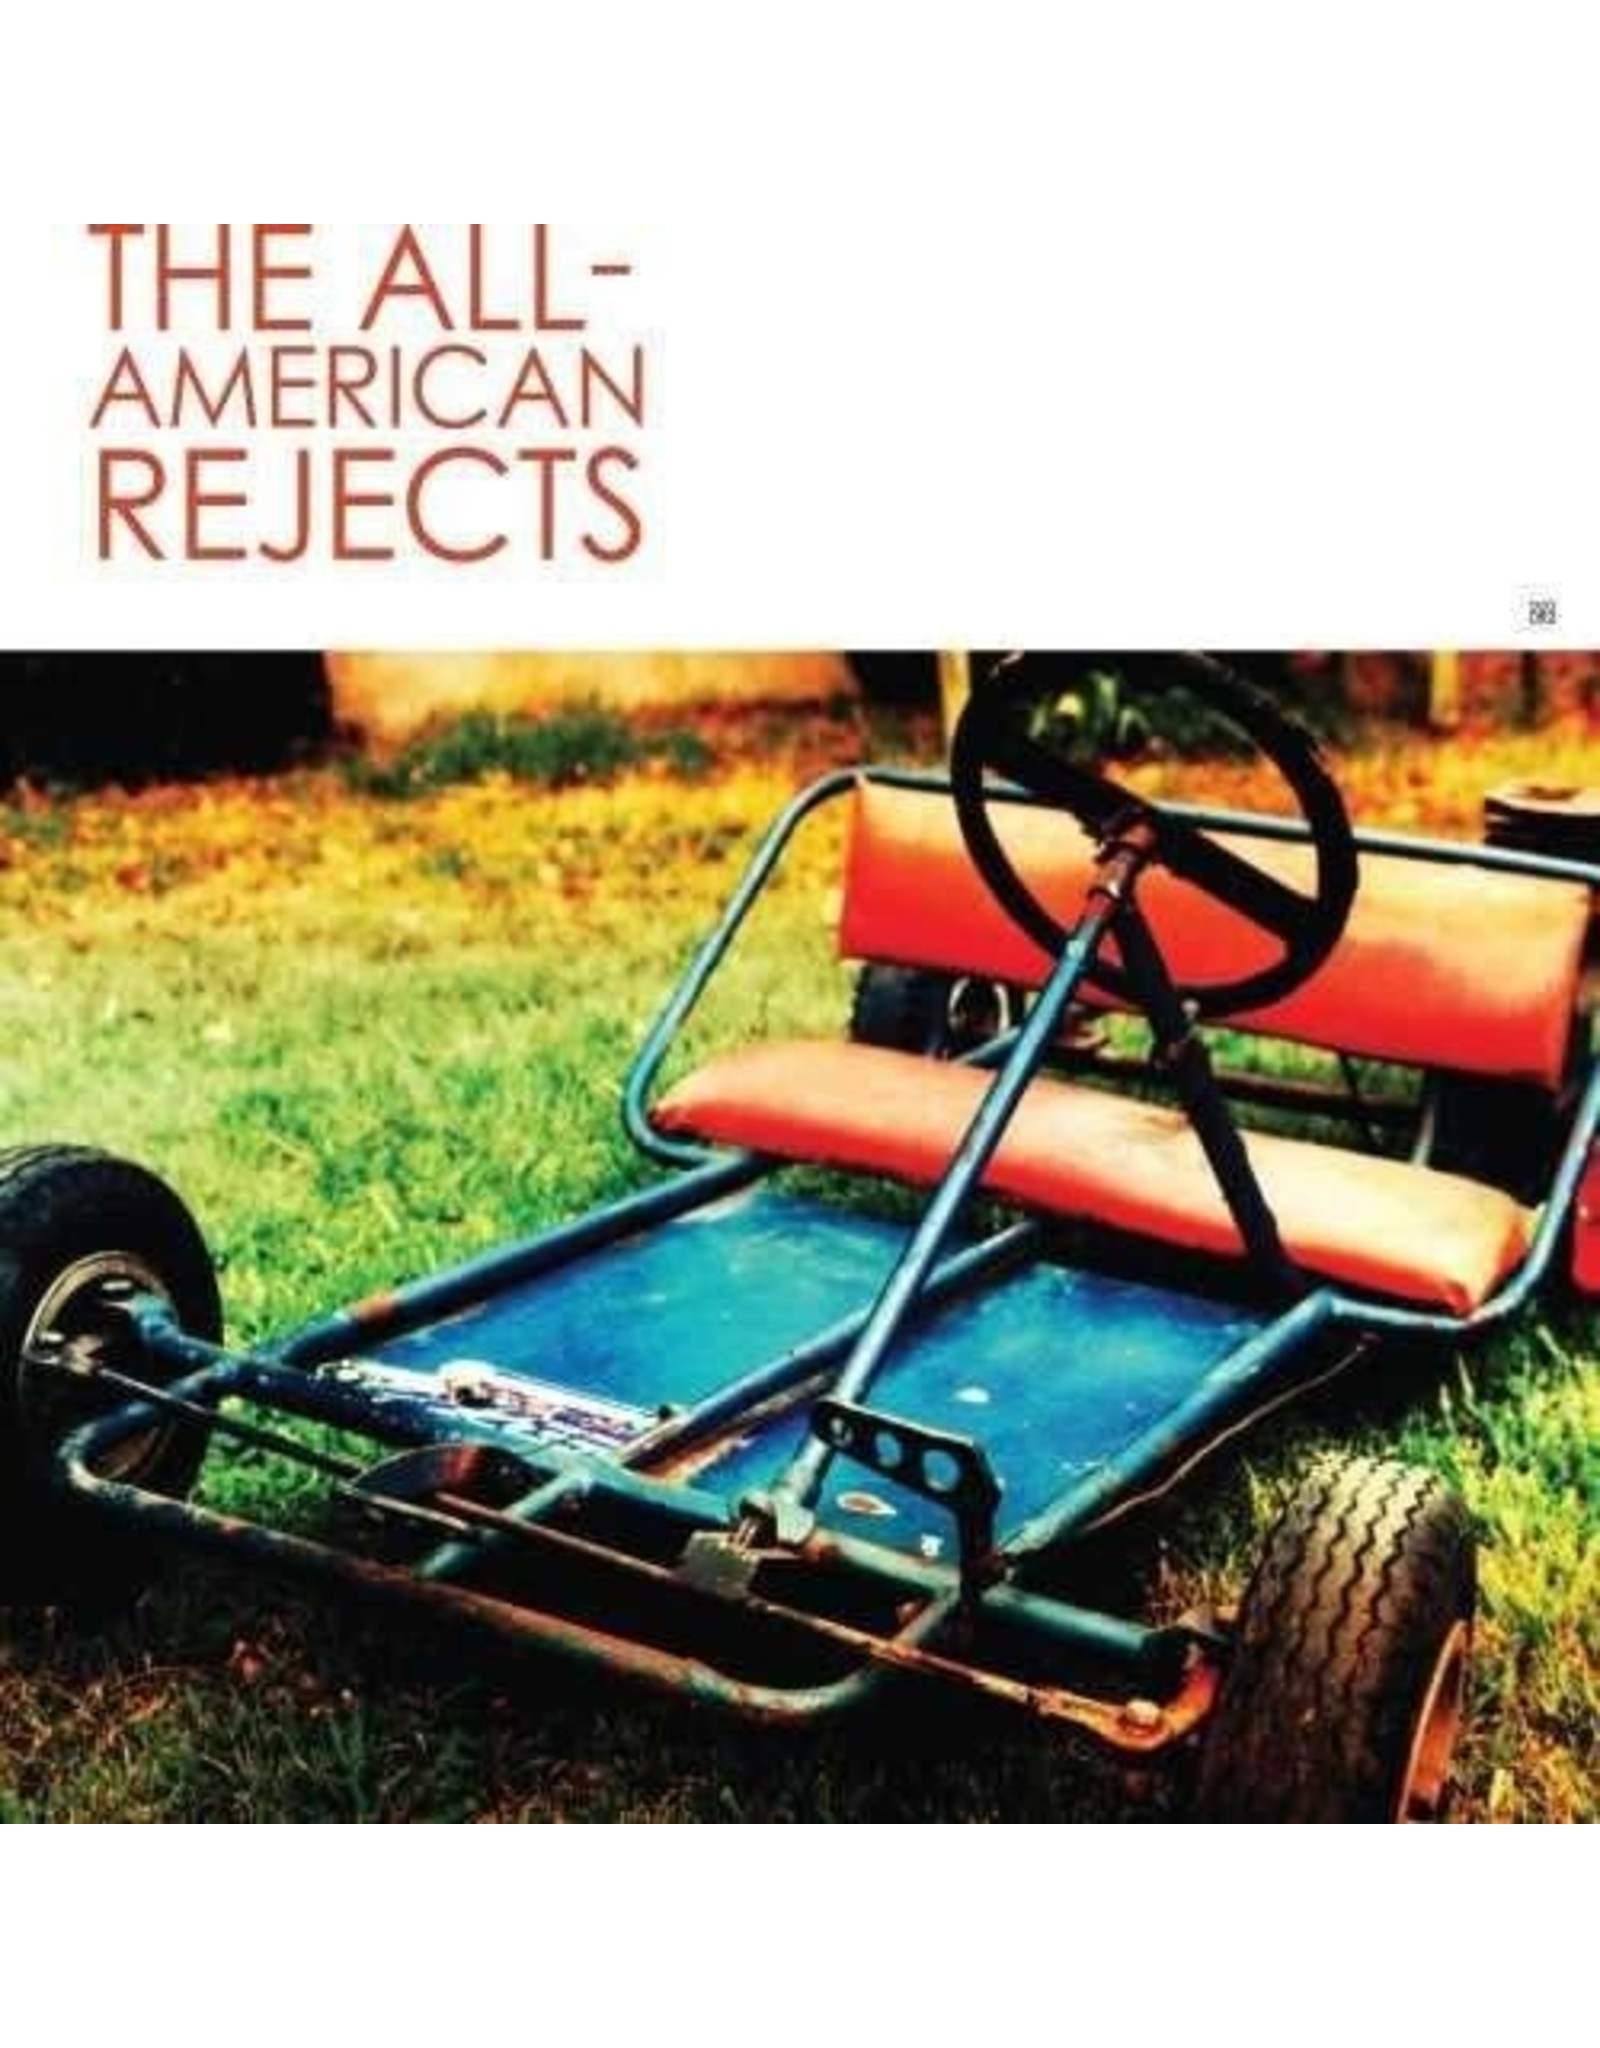 All-American Rejects / All-American Rejects (D)